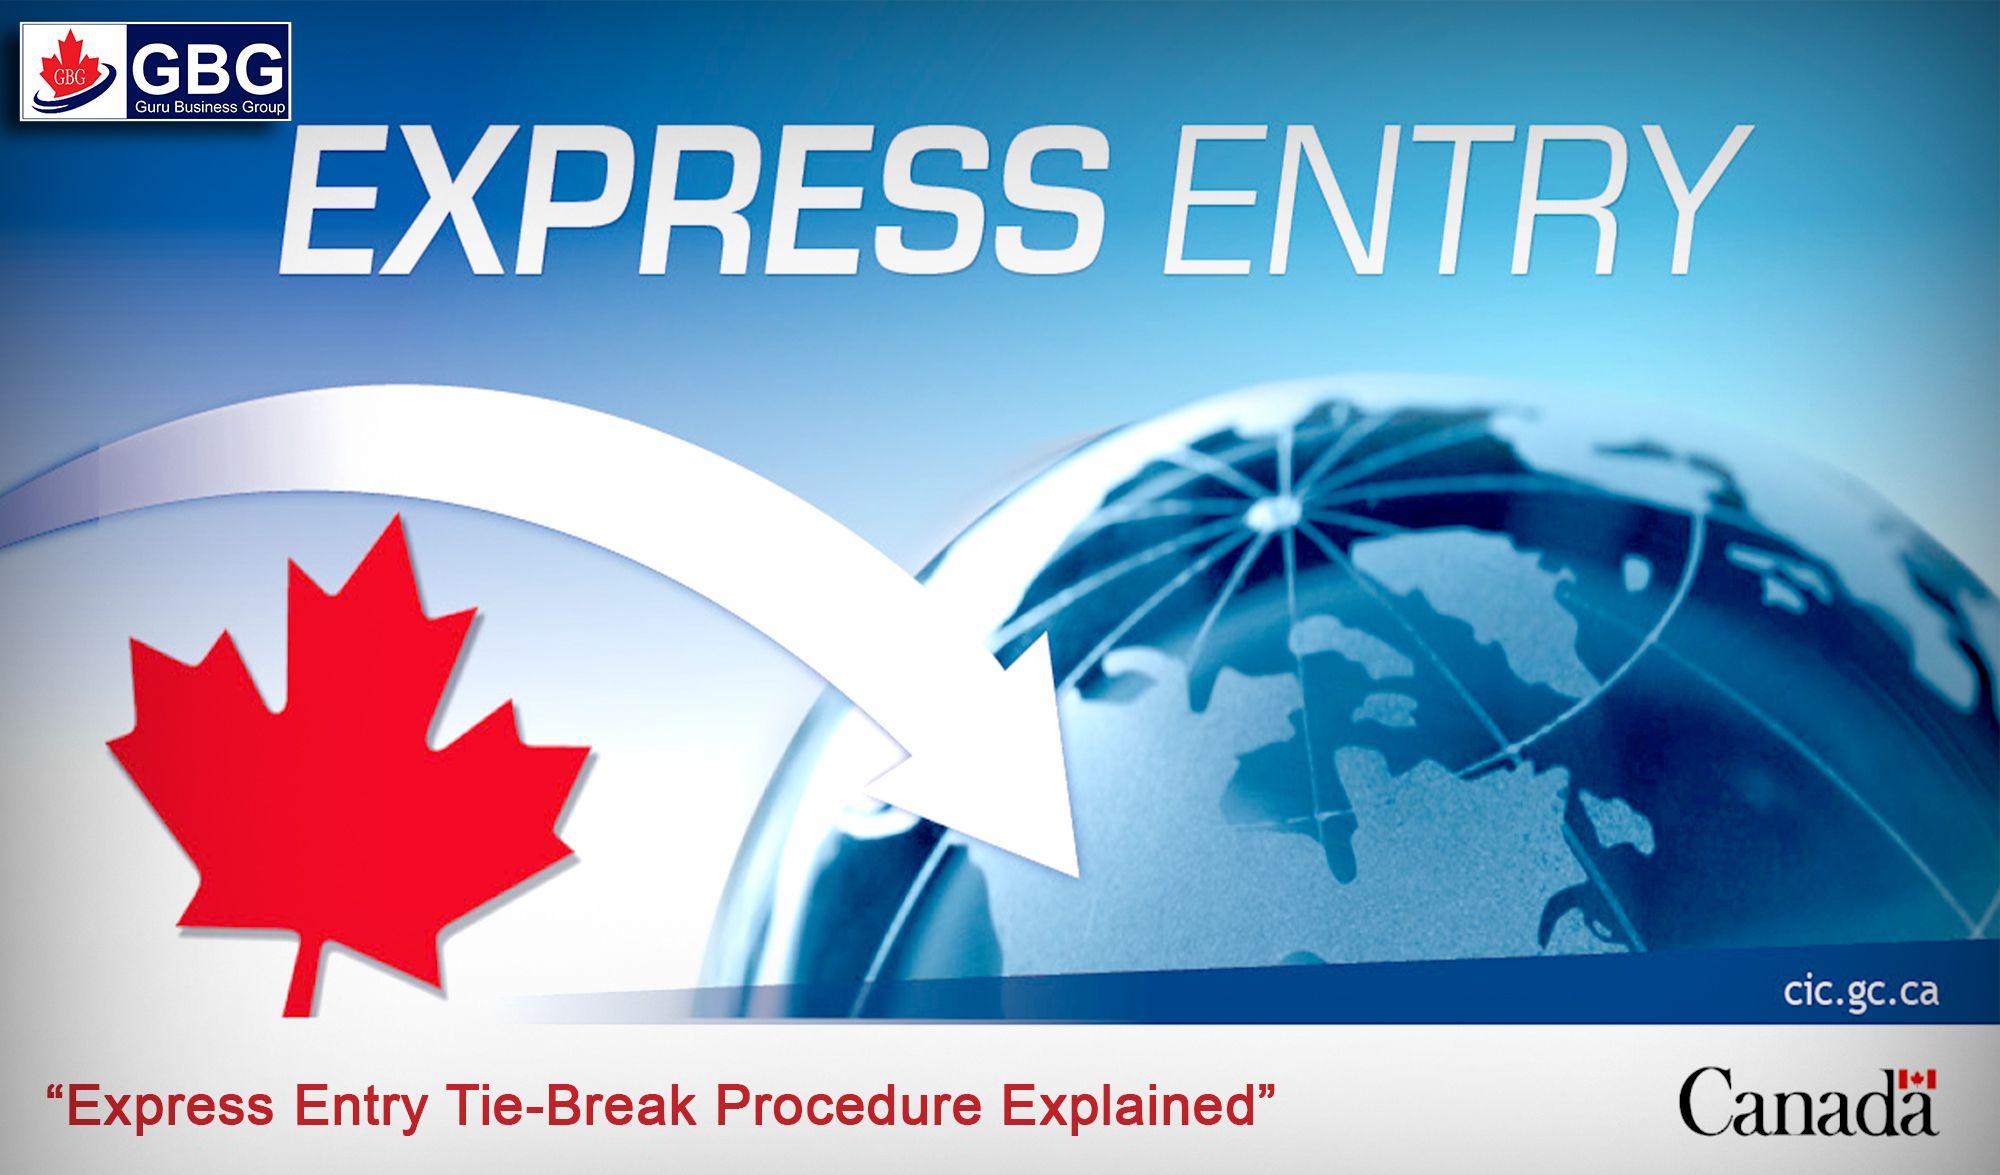 Express Entry TieBreak Procedure Explained Canada, New